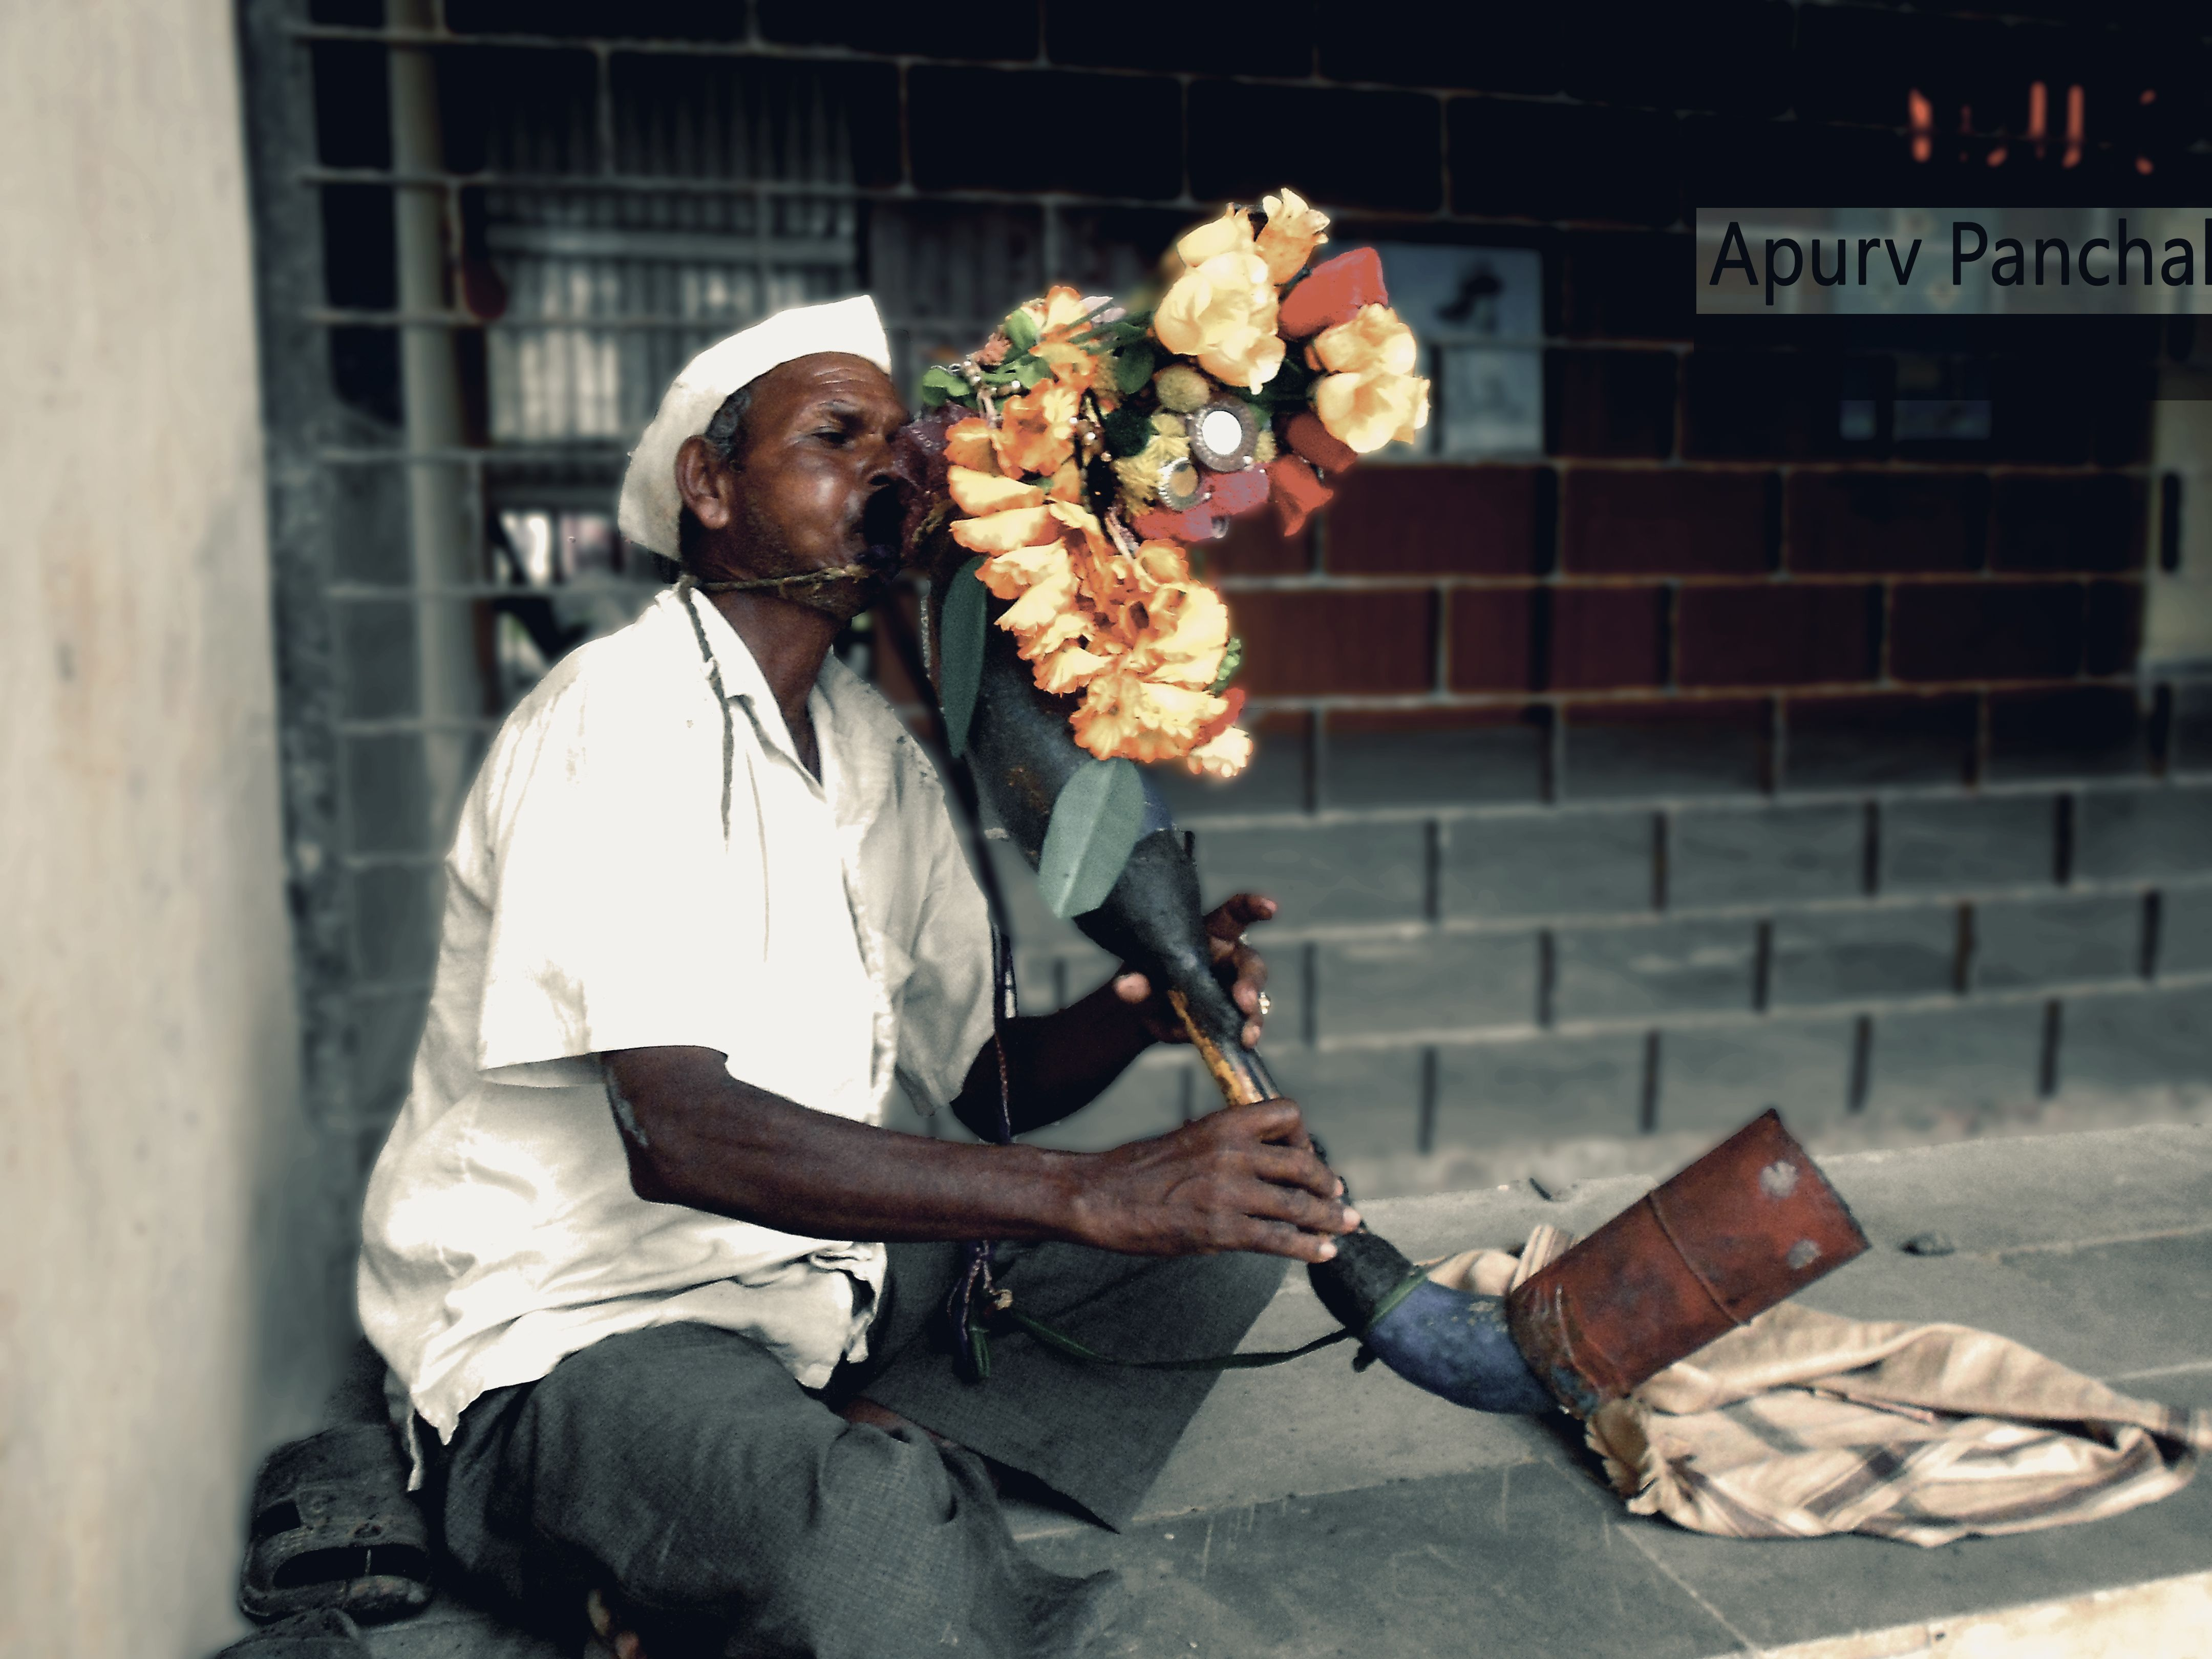 #street #StreetPhotography #Saputara #Gujarat #Music #instrument #Photoshop #NoDSLR ;D #OLD #Soulful